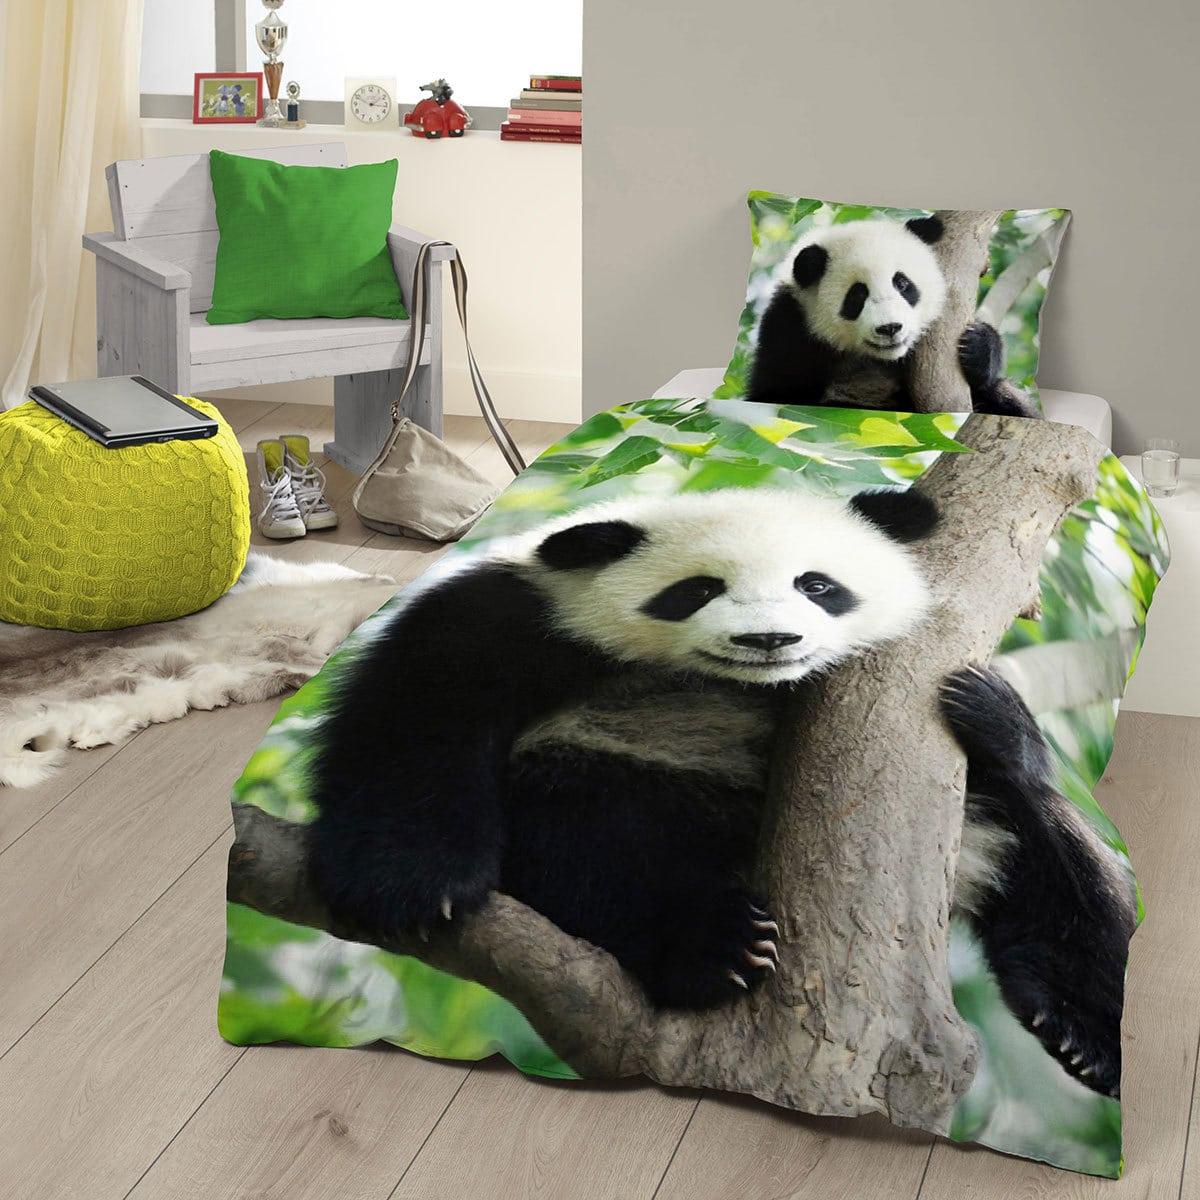 Good Morning Bettwäsche Panda Günstig Online Kaufen Bei Bettwaren Shop